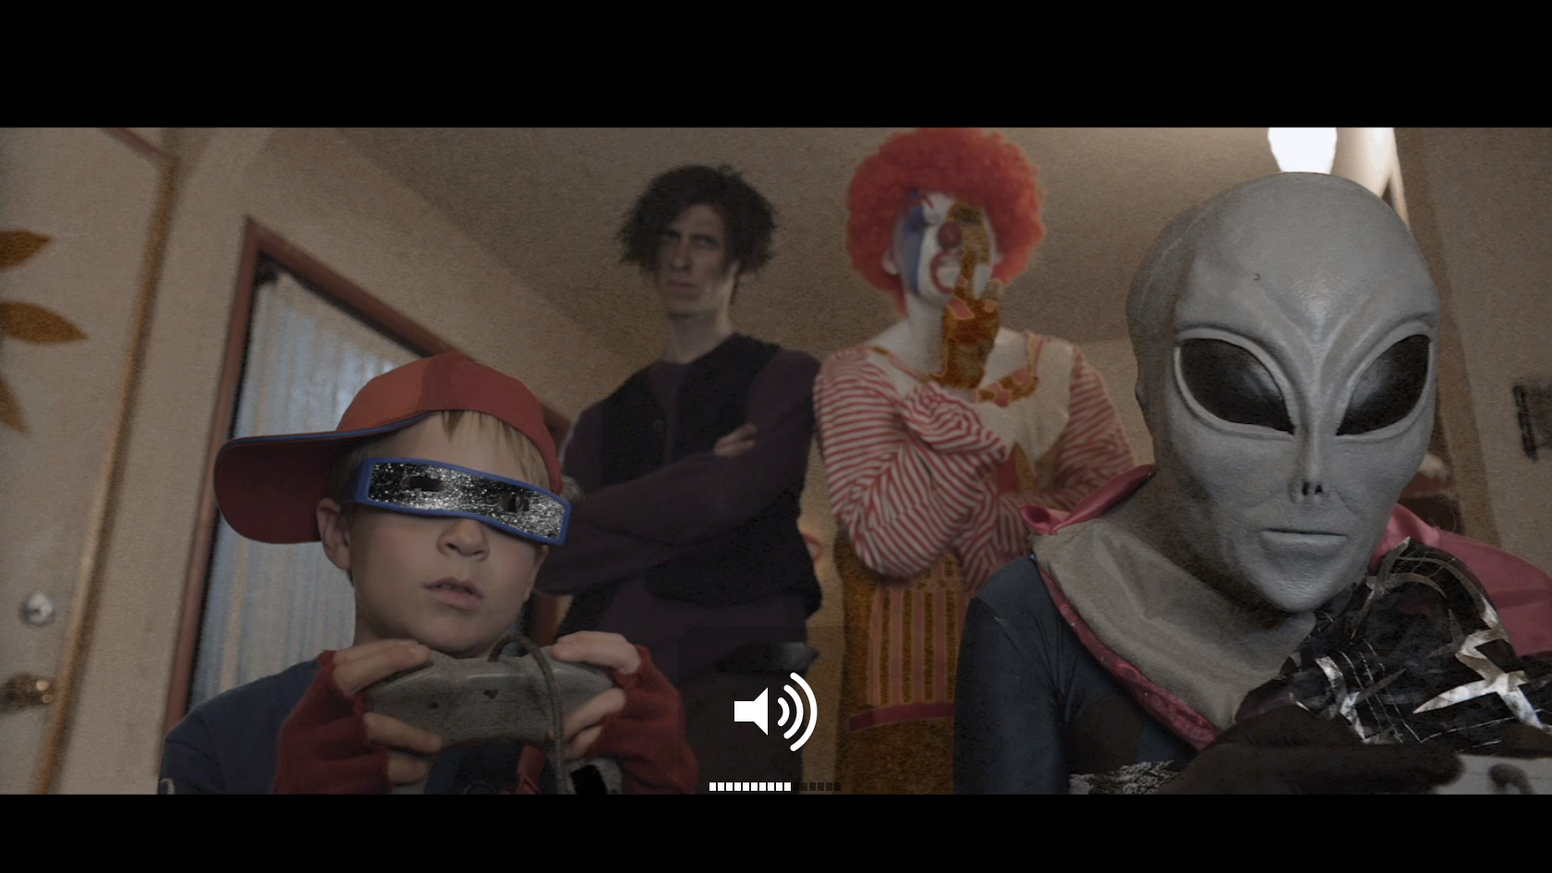 ILLUMINATI PUPPET-A sci fi conspiracy FEATURE FILM by Gregg